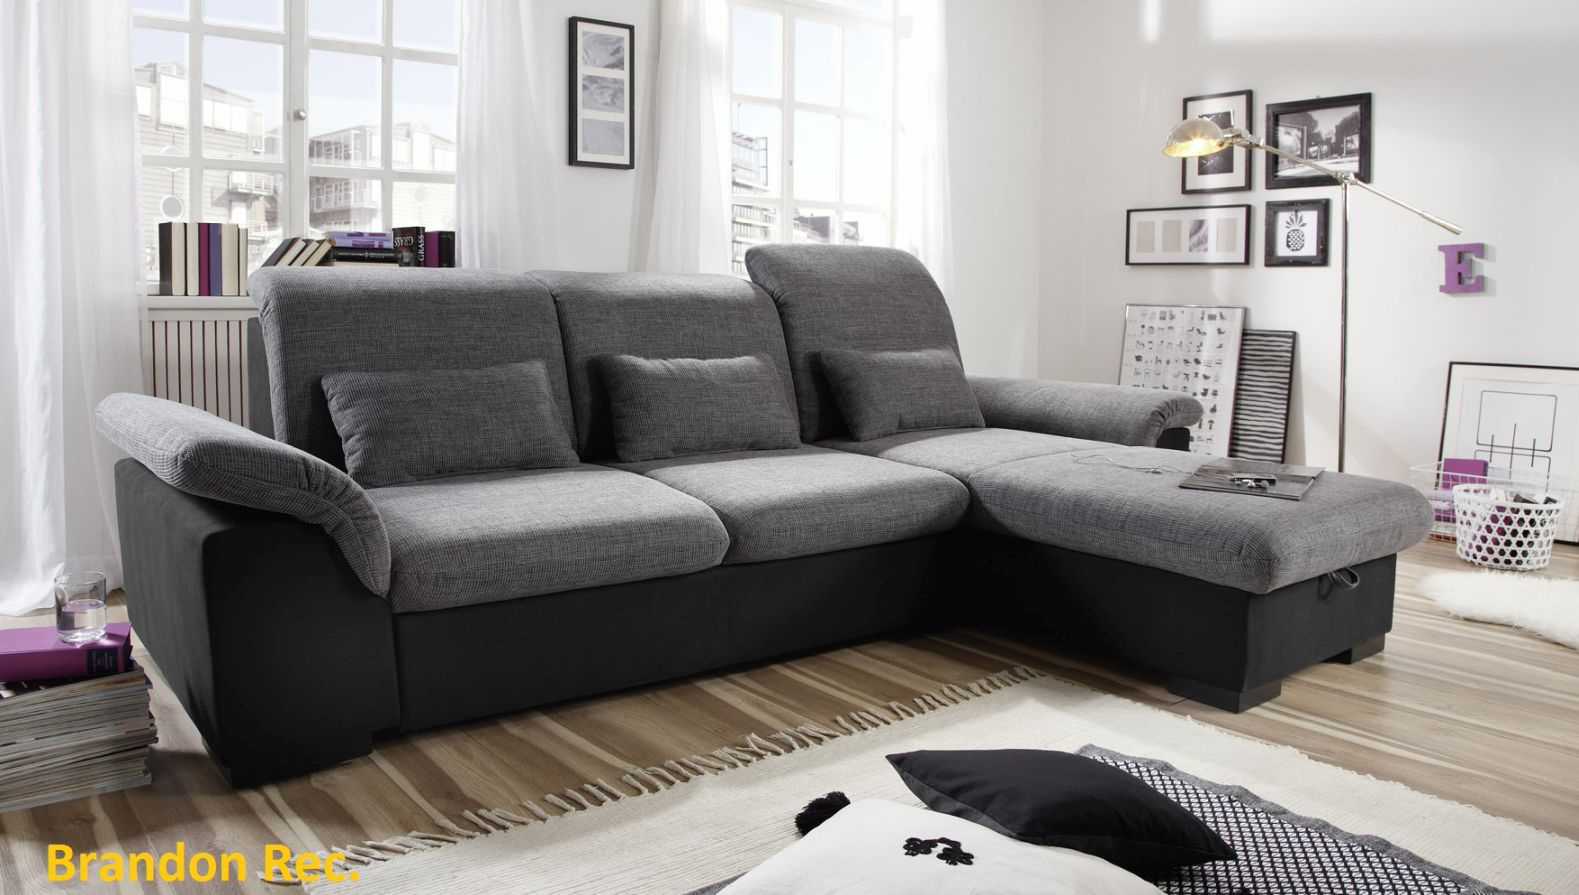 ecksofa couch schlafsofa sofabett funktionssofa ausziehbar. Black Bedroom Furniture Sets. Home Design Ideas